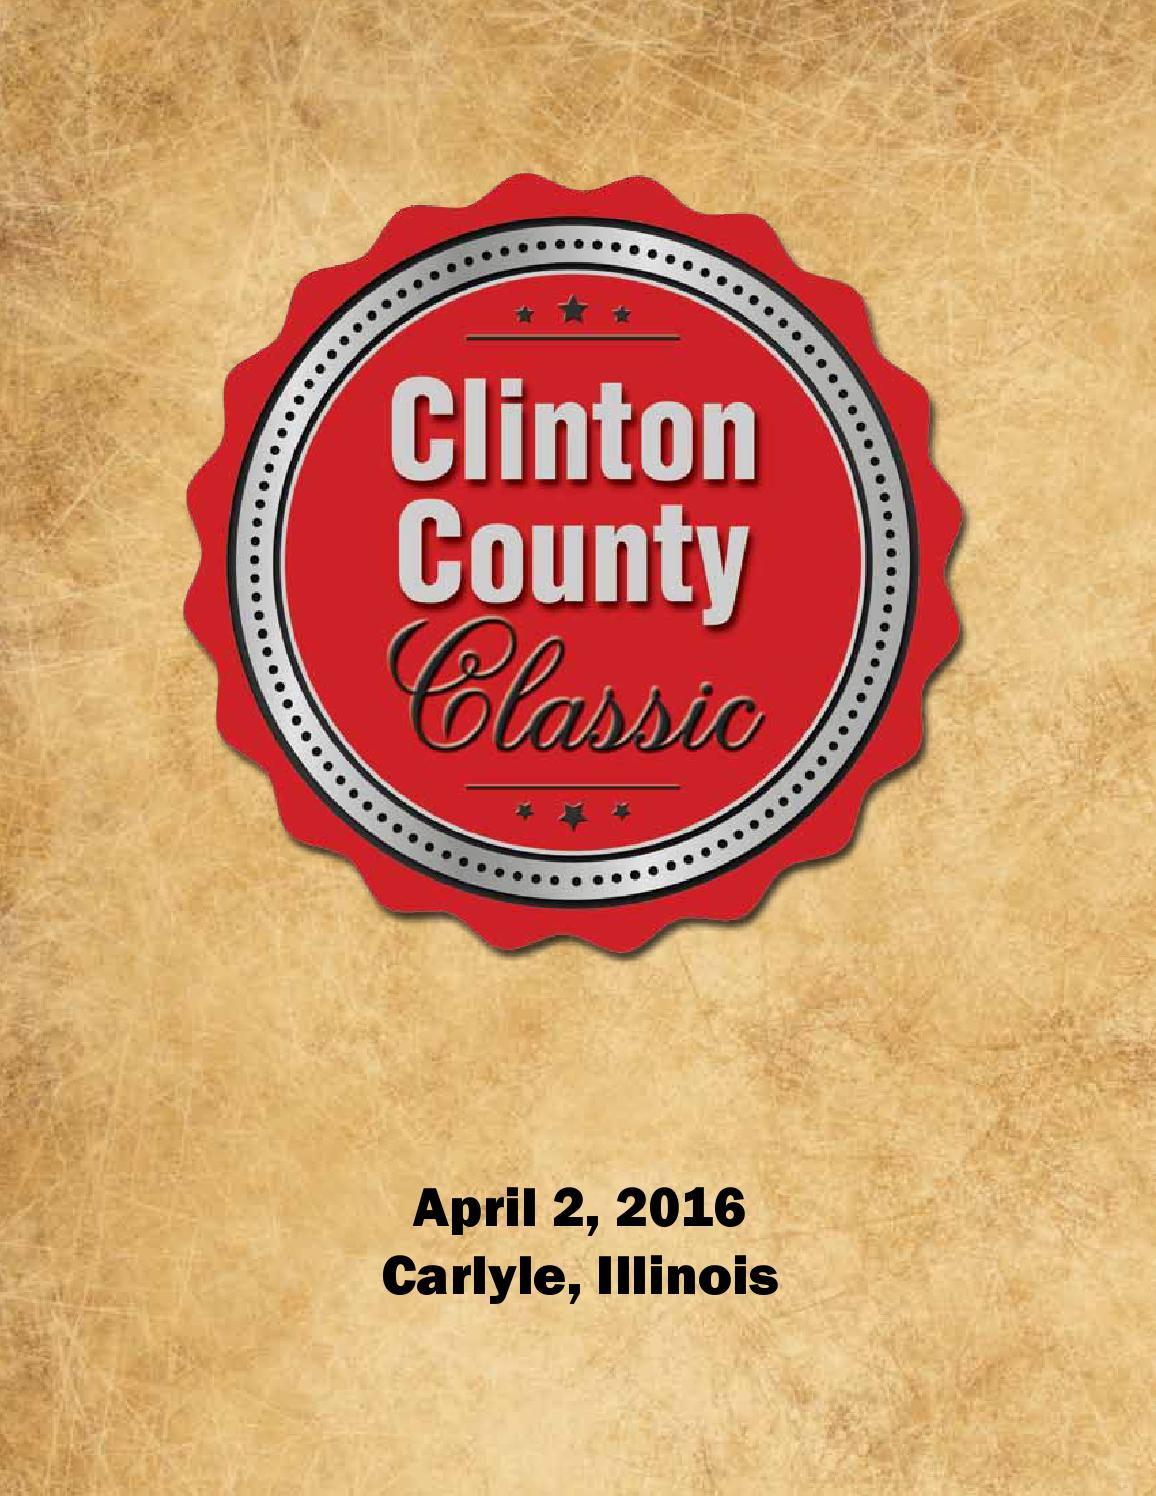 Illinois clinton county aviston - Clinton County Classic Sale Catalog April 2 2016 By Illinois Holstein Herald Issuu